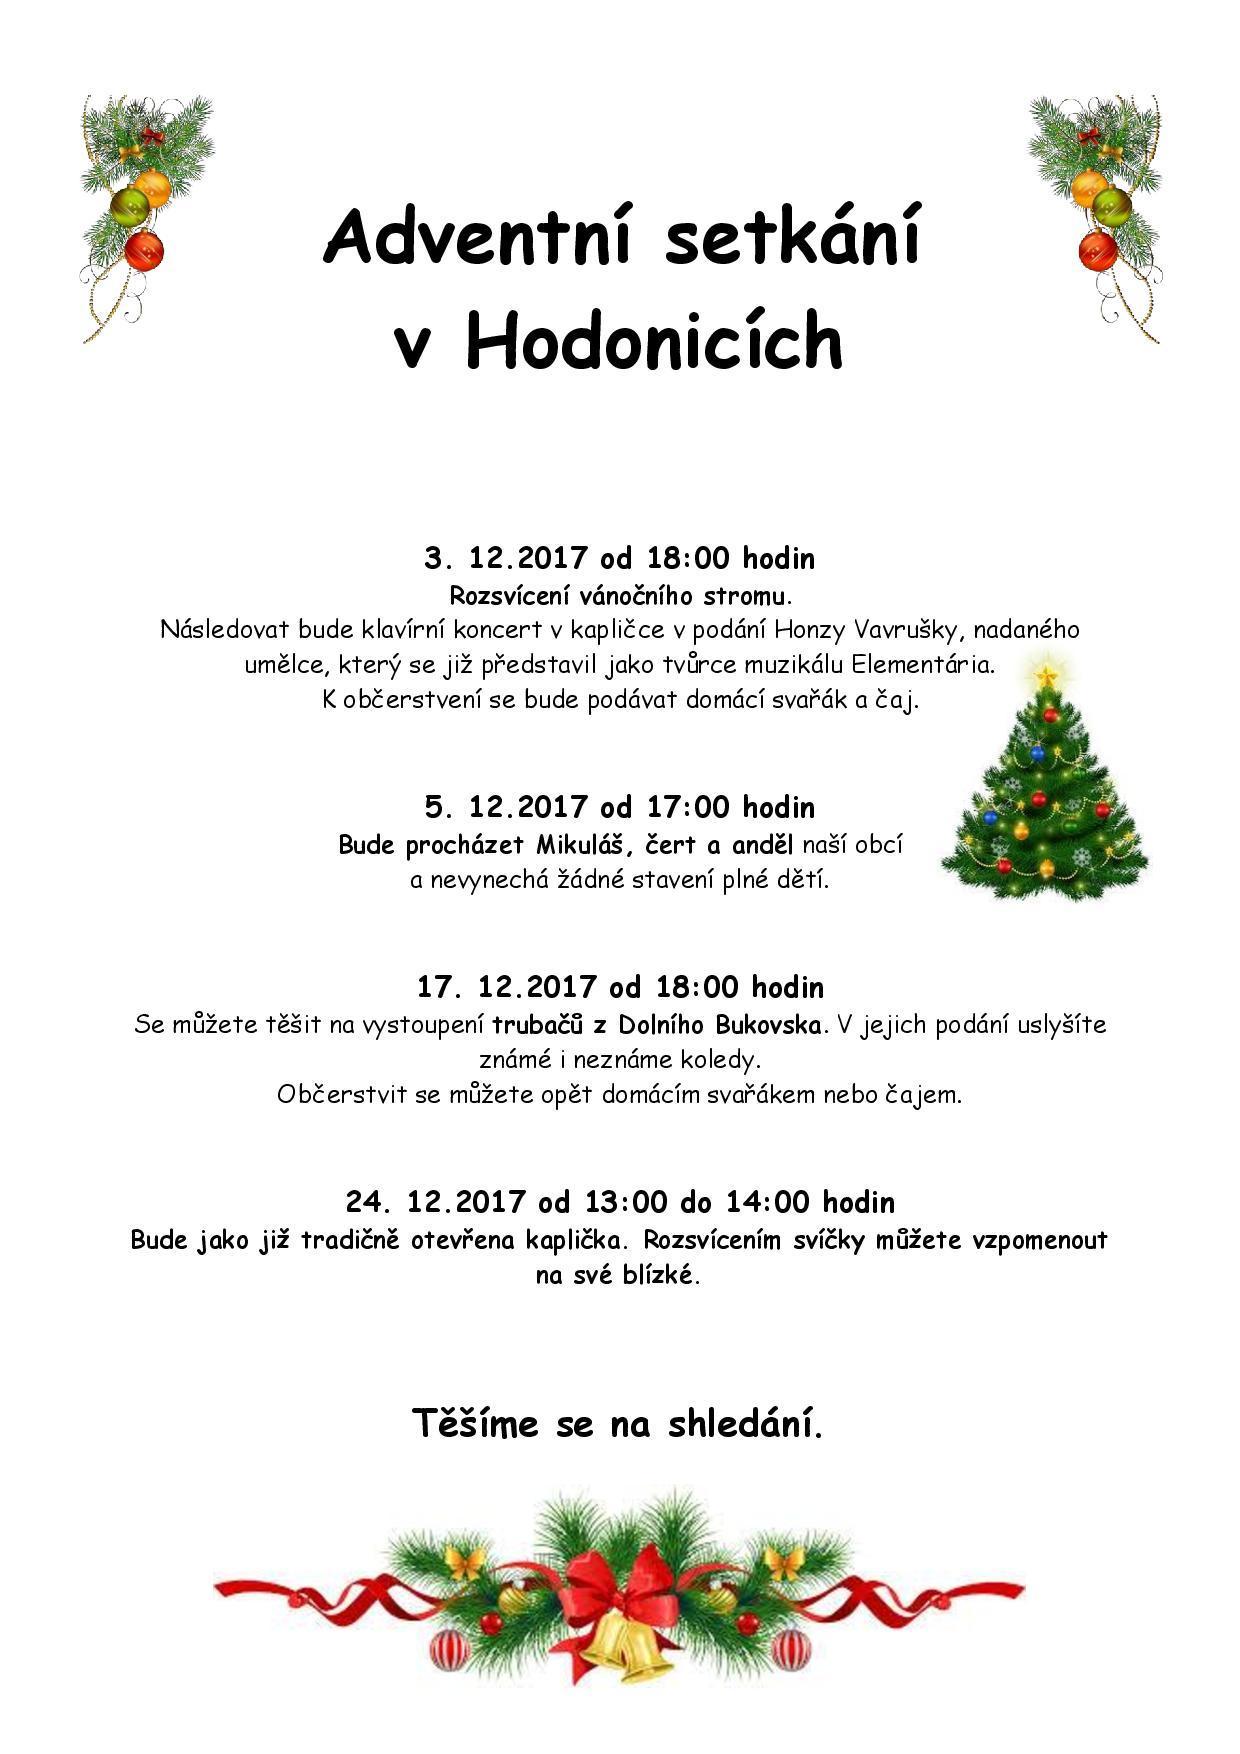 Hodonický advent 2017